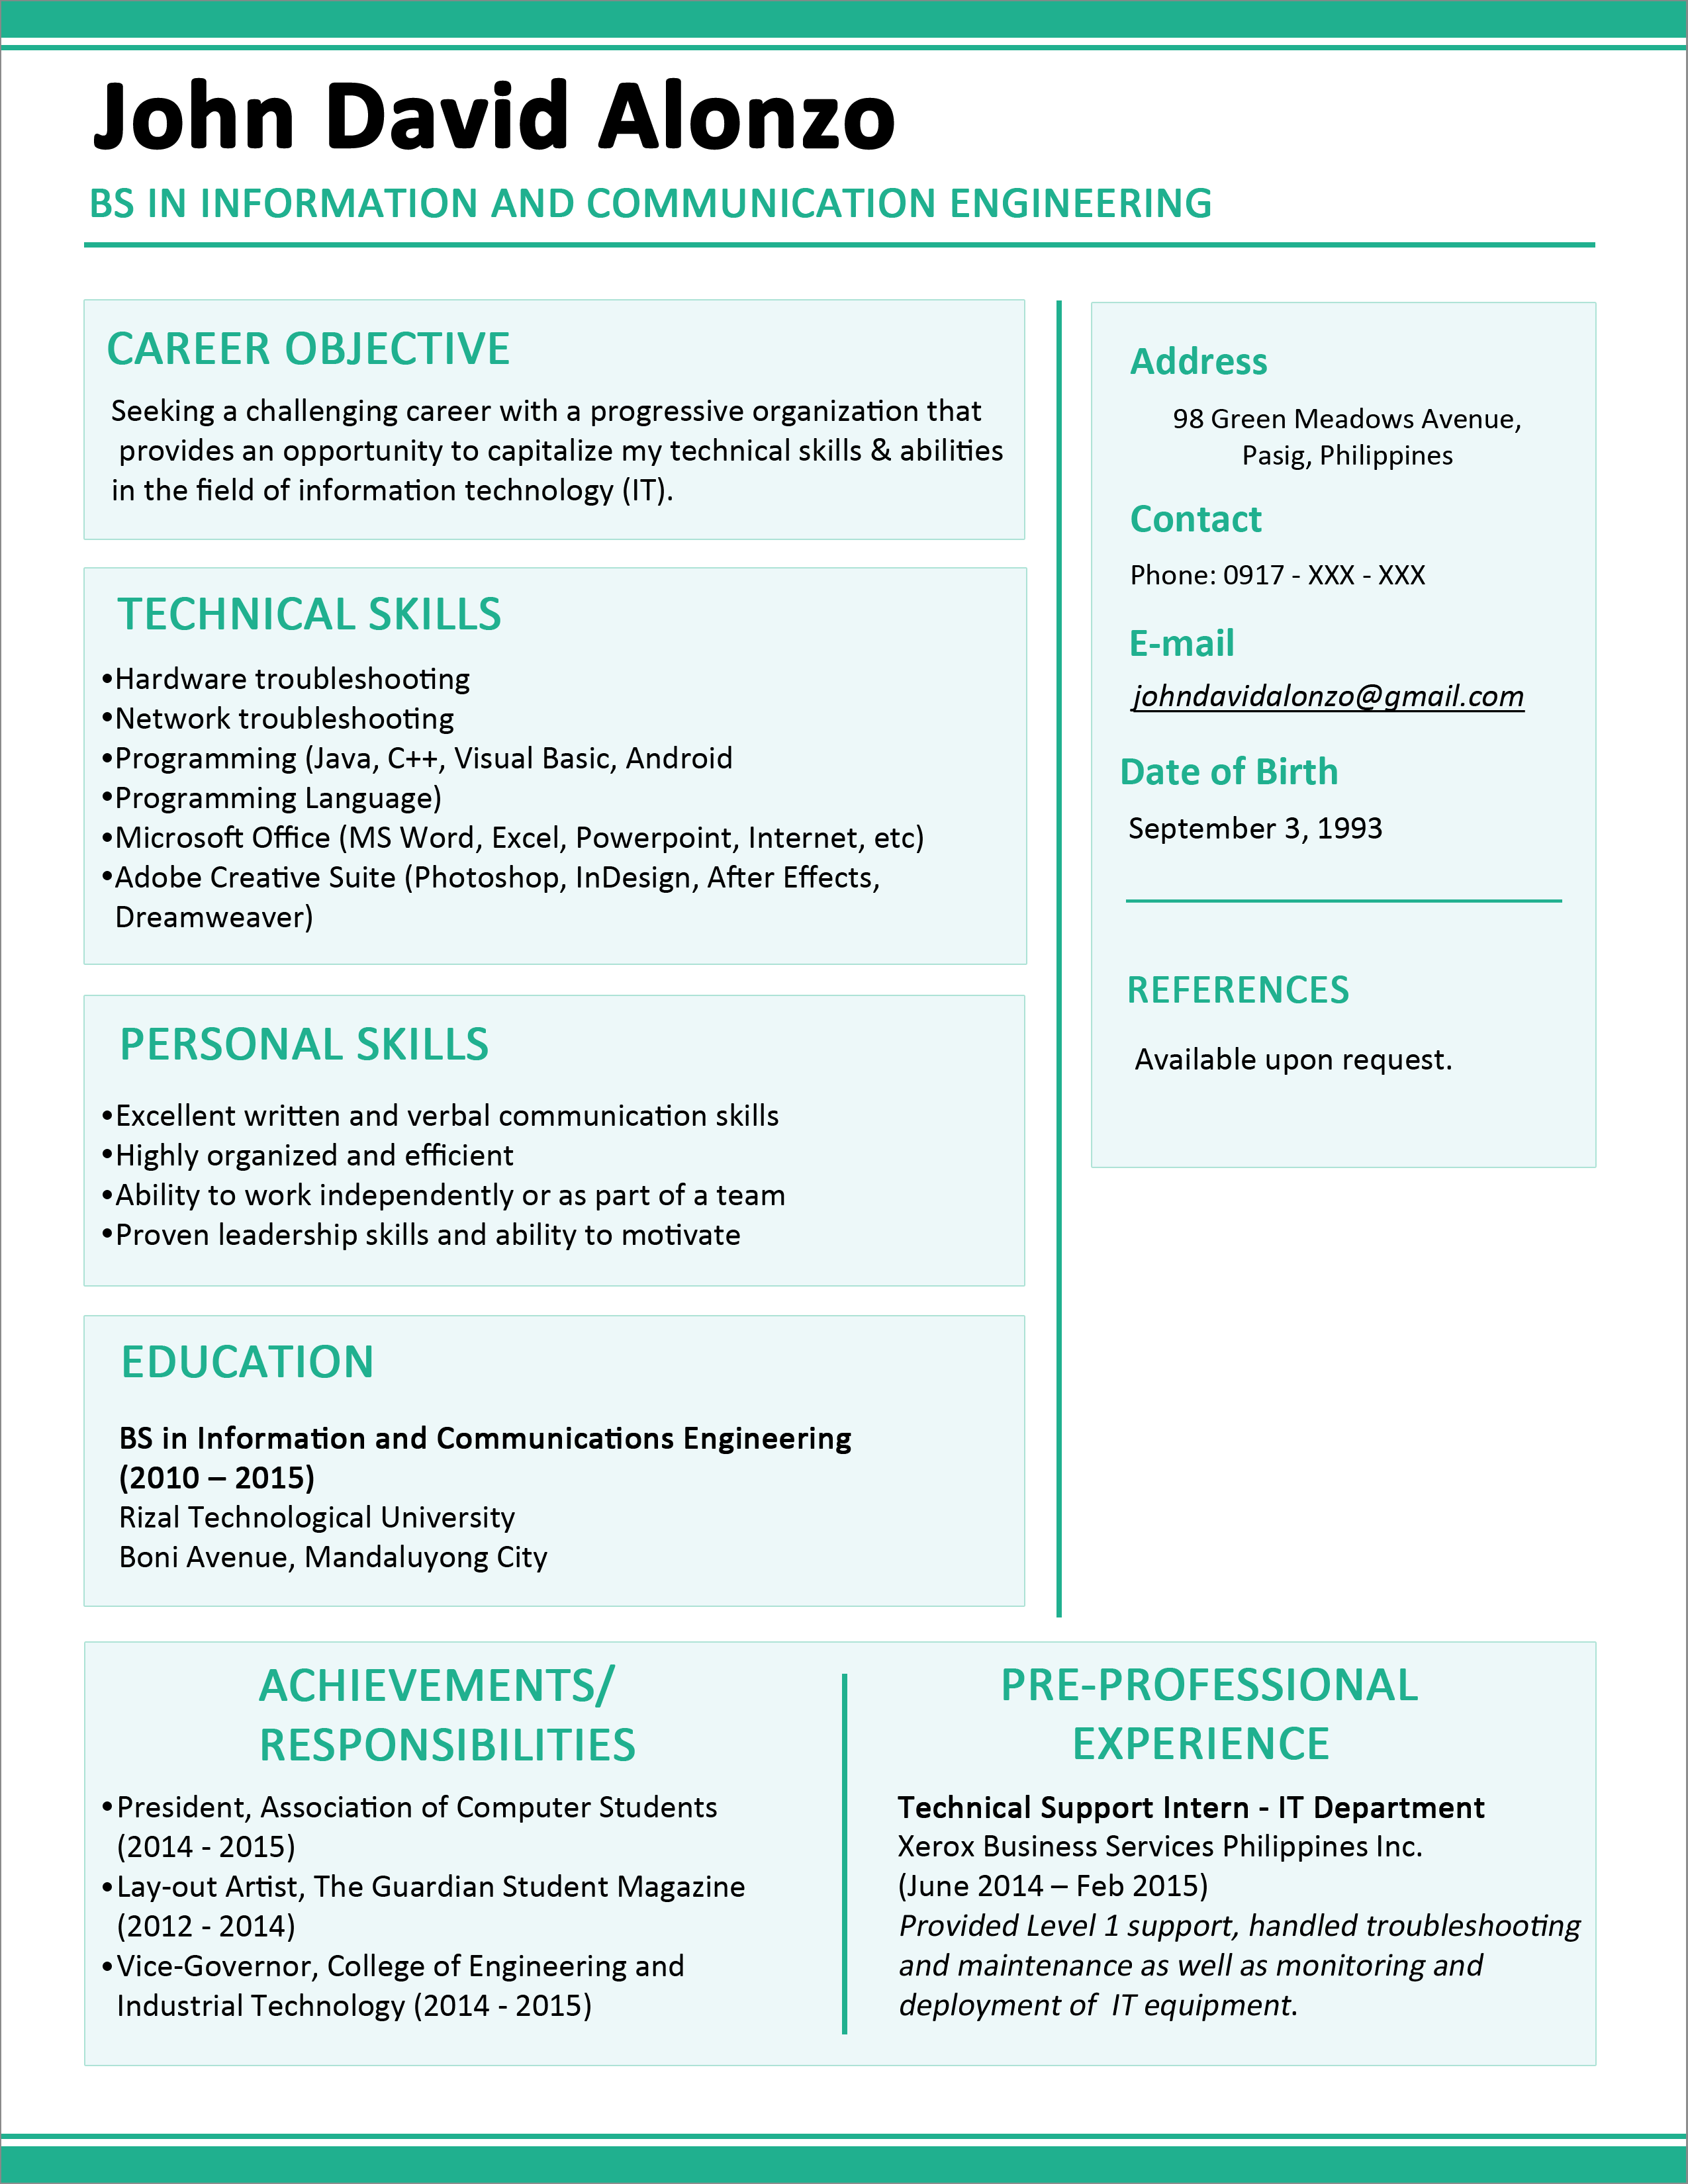 Example Resume For Job Application For Fresh Graduate